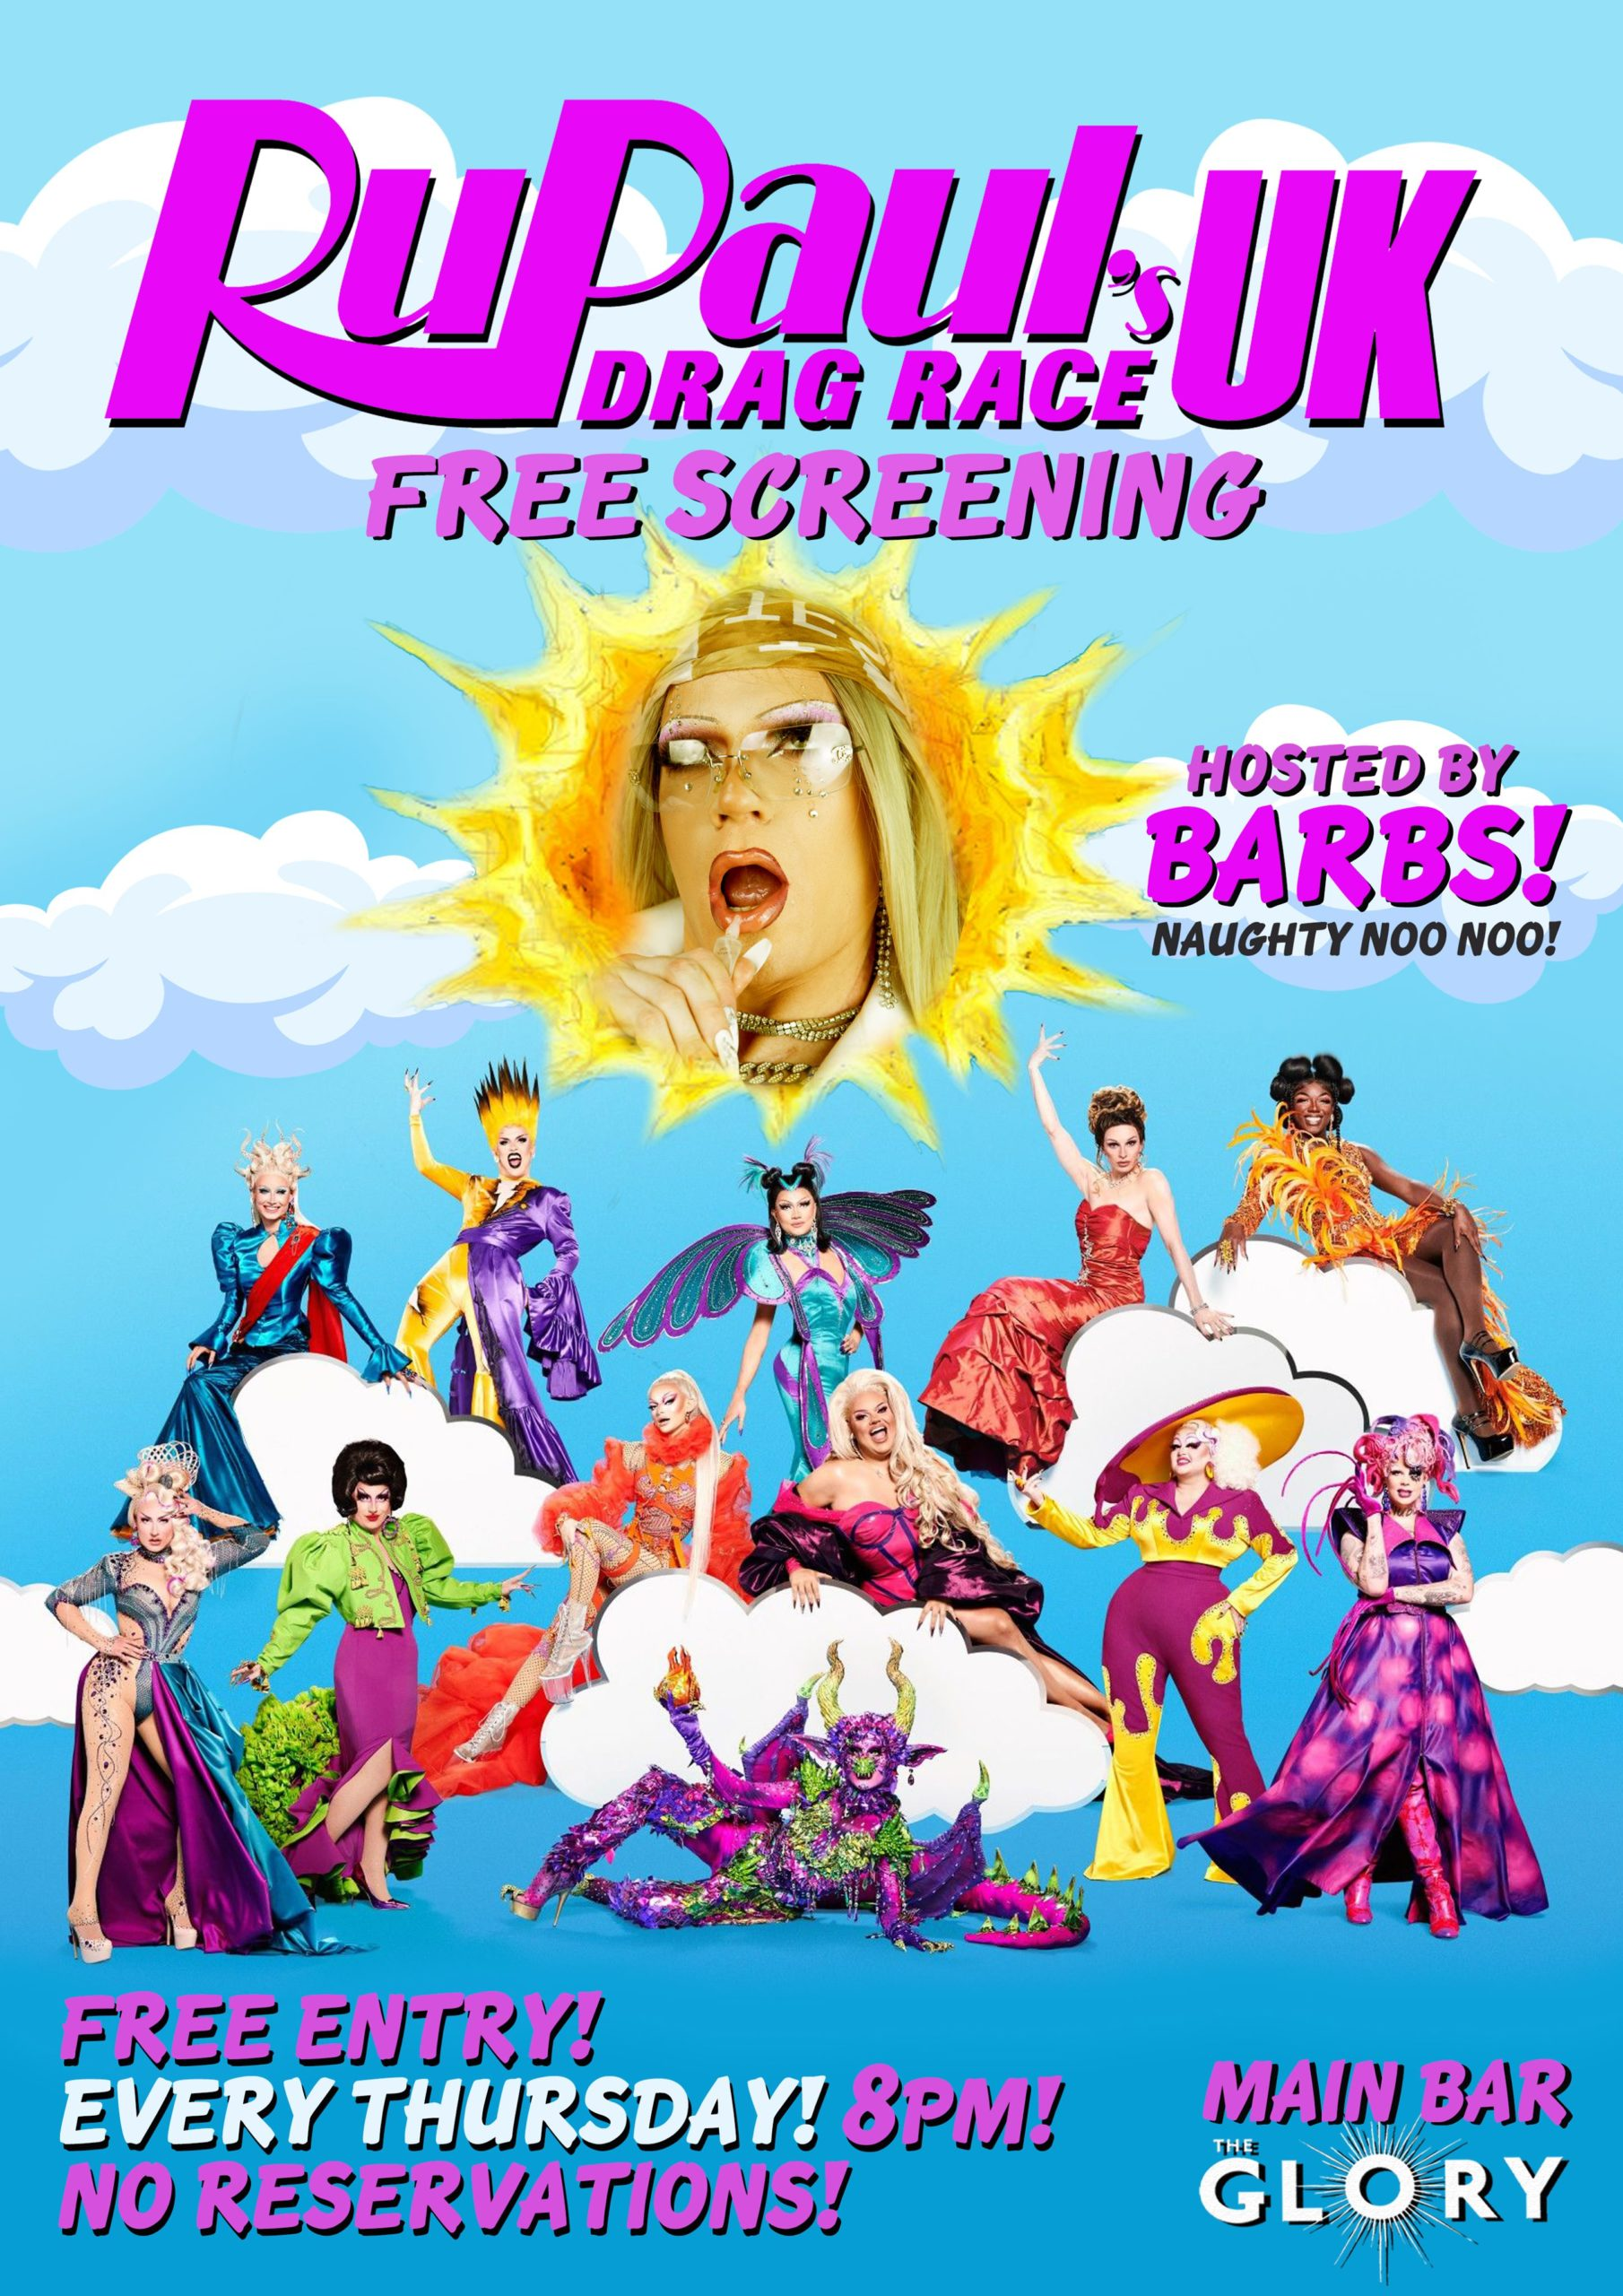 RuPaul's Drag Race UK screening